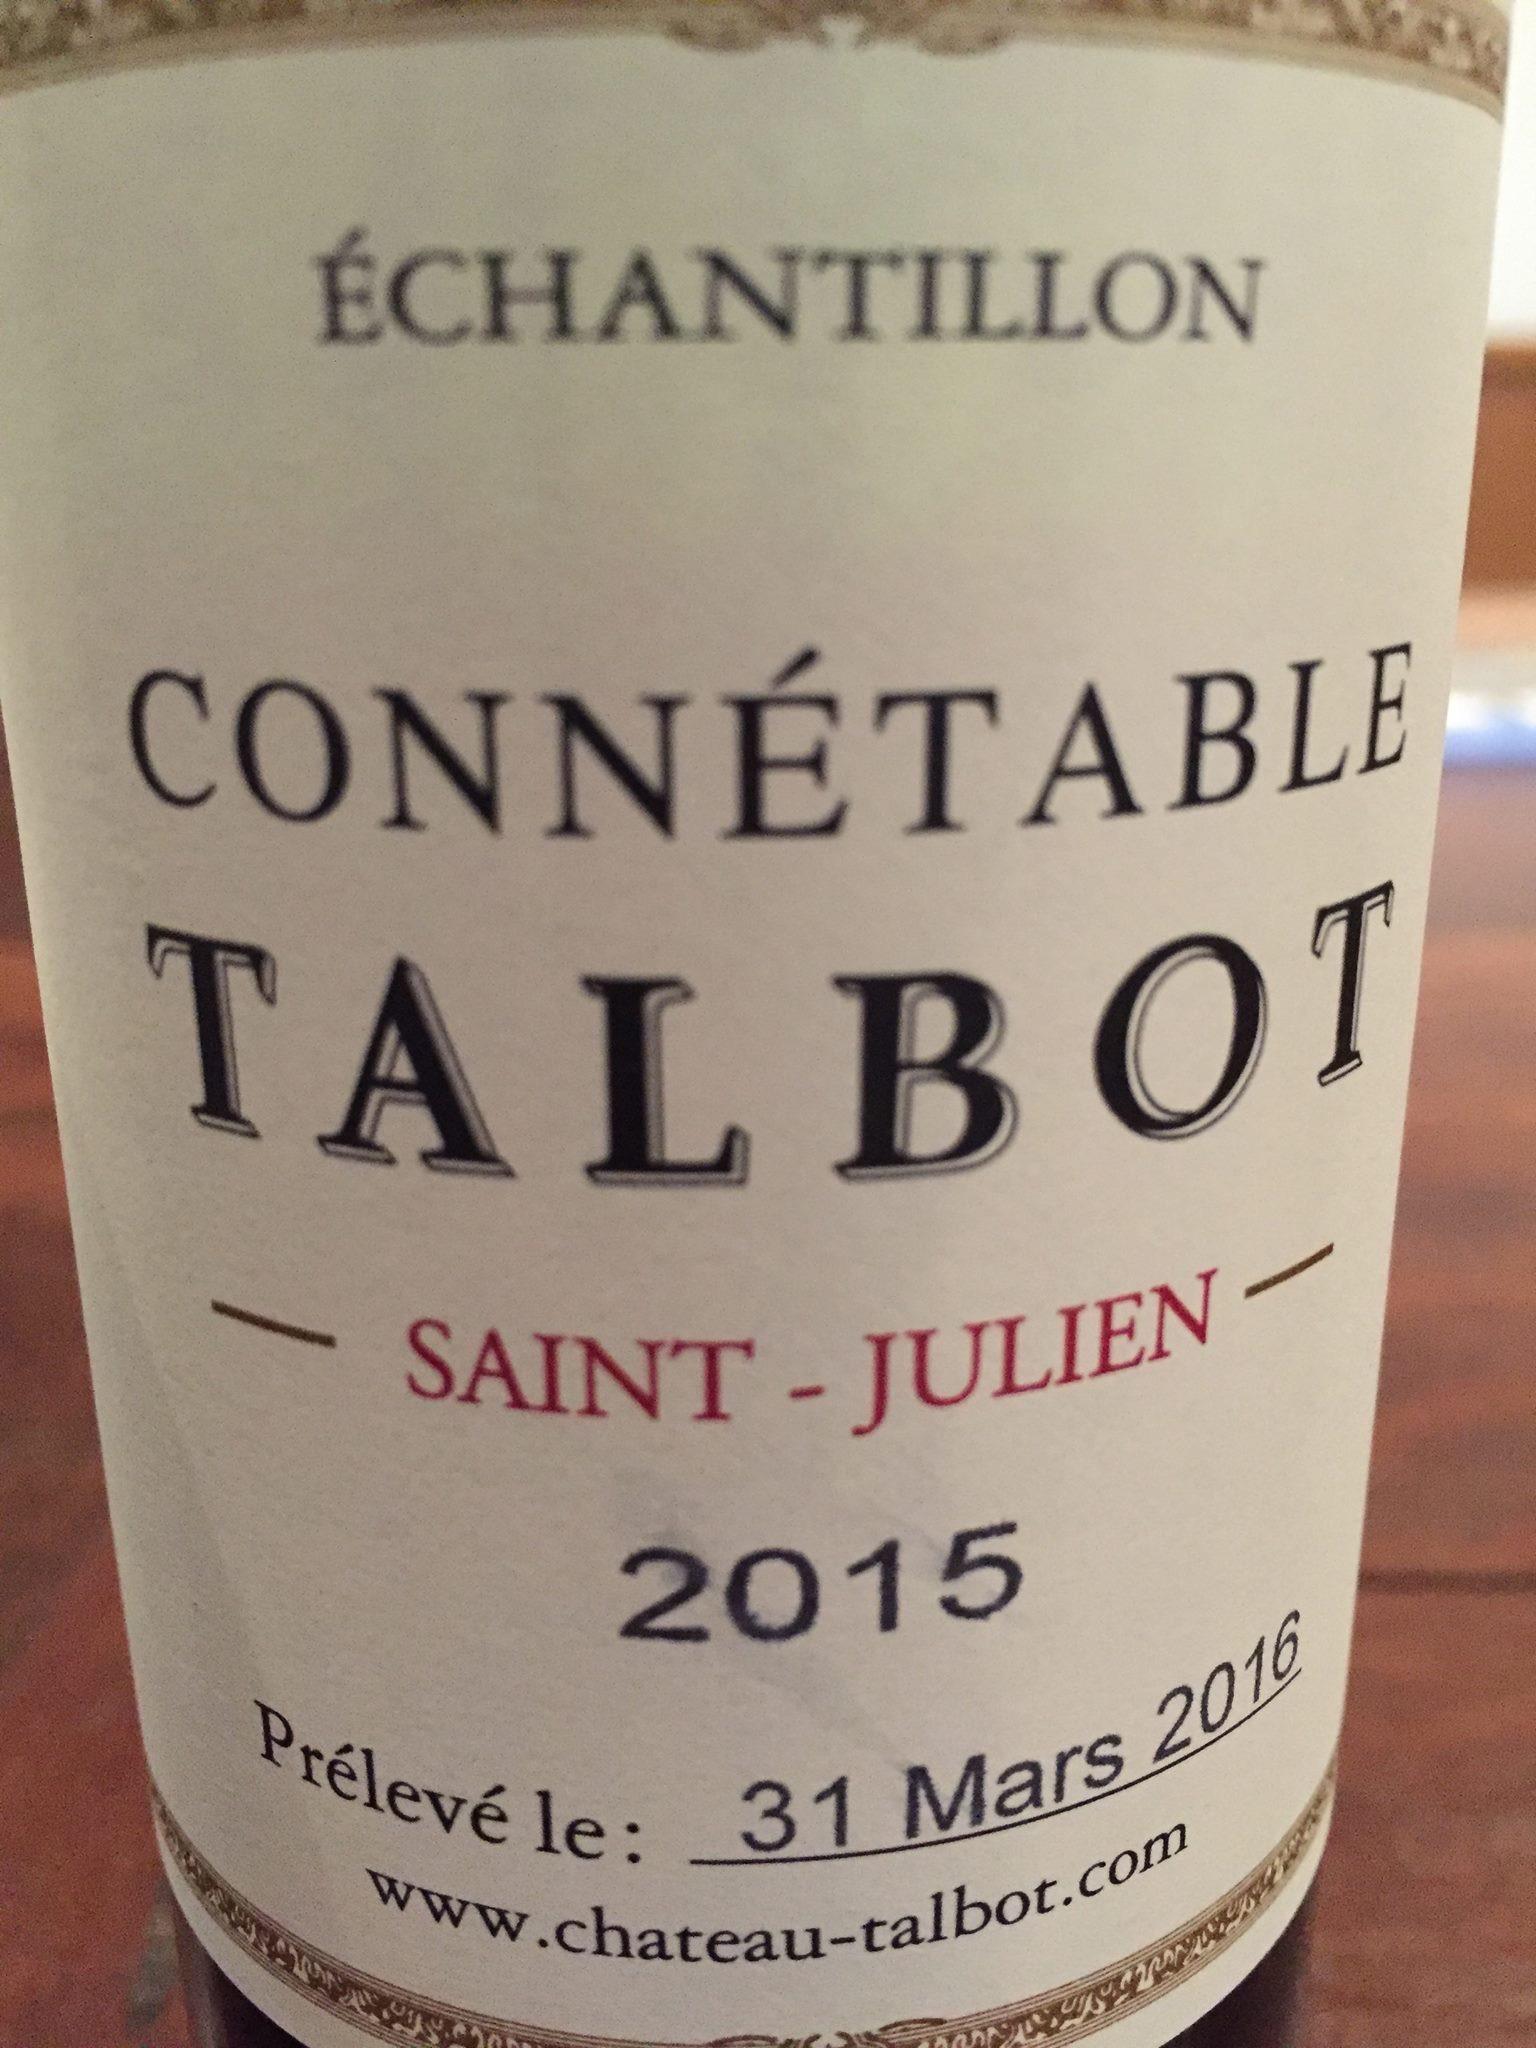 Connétable Talbot 2015 – Saint-Julien